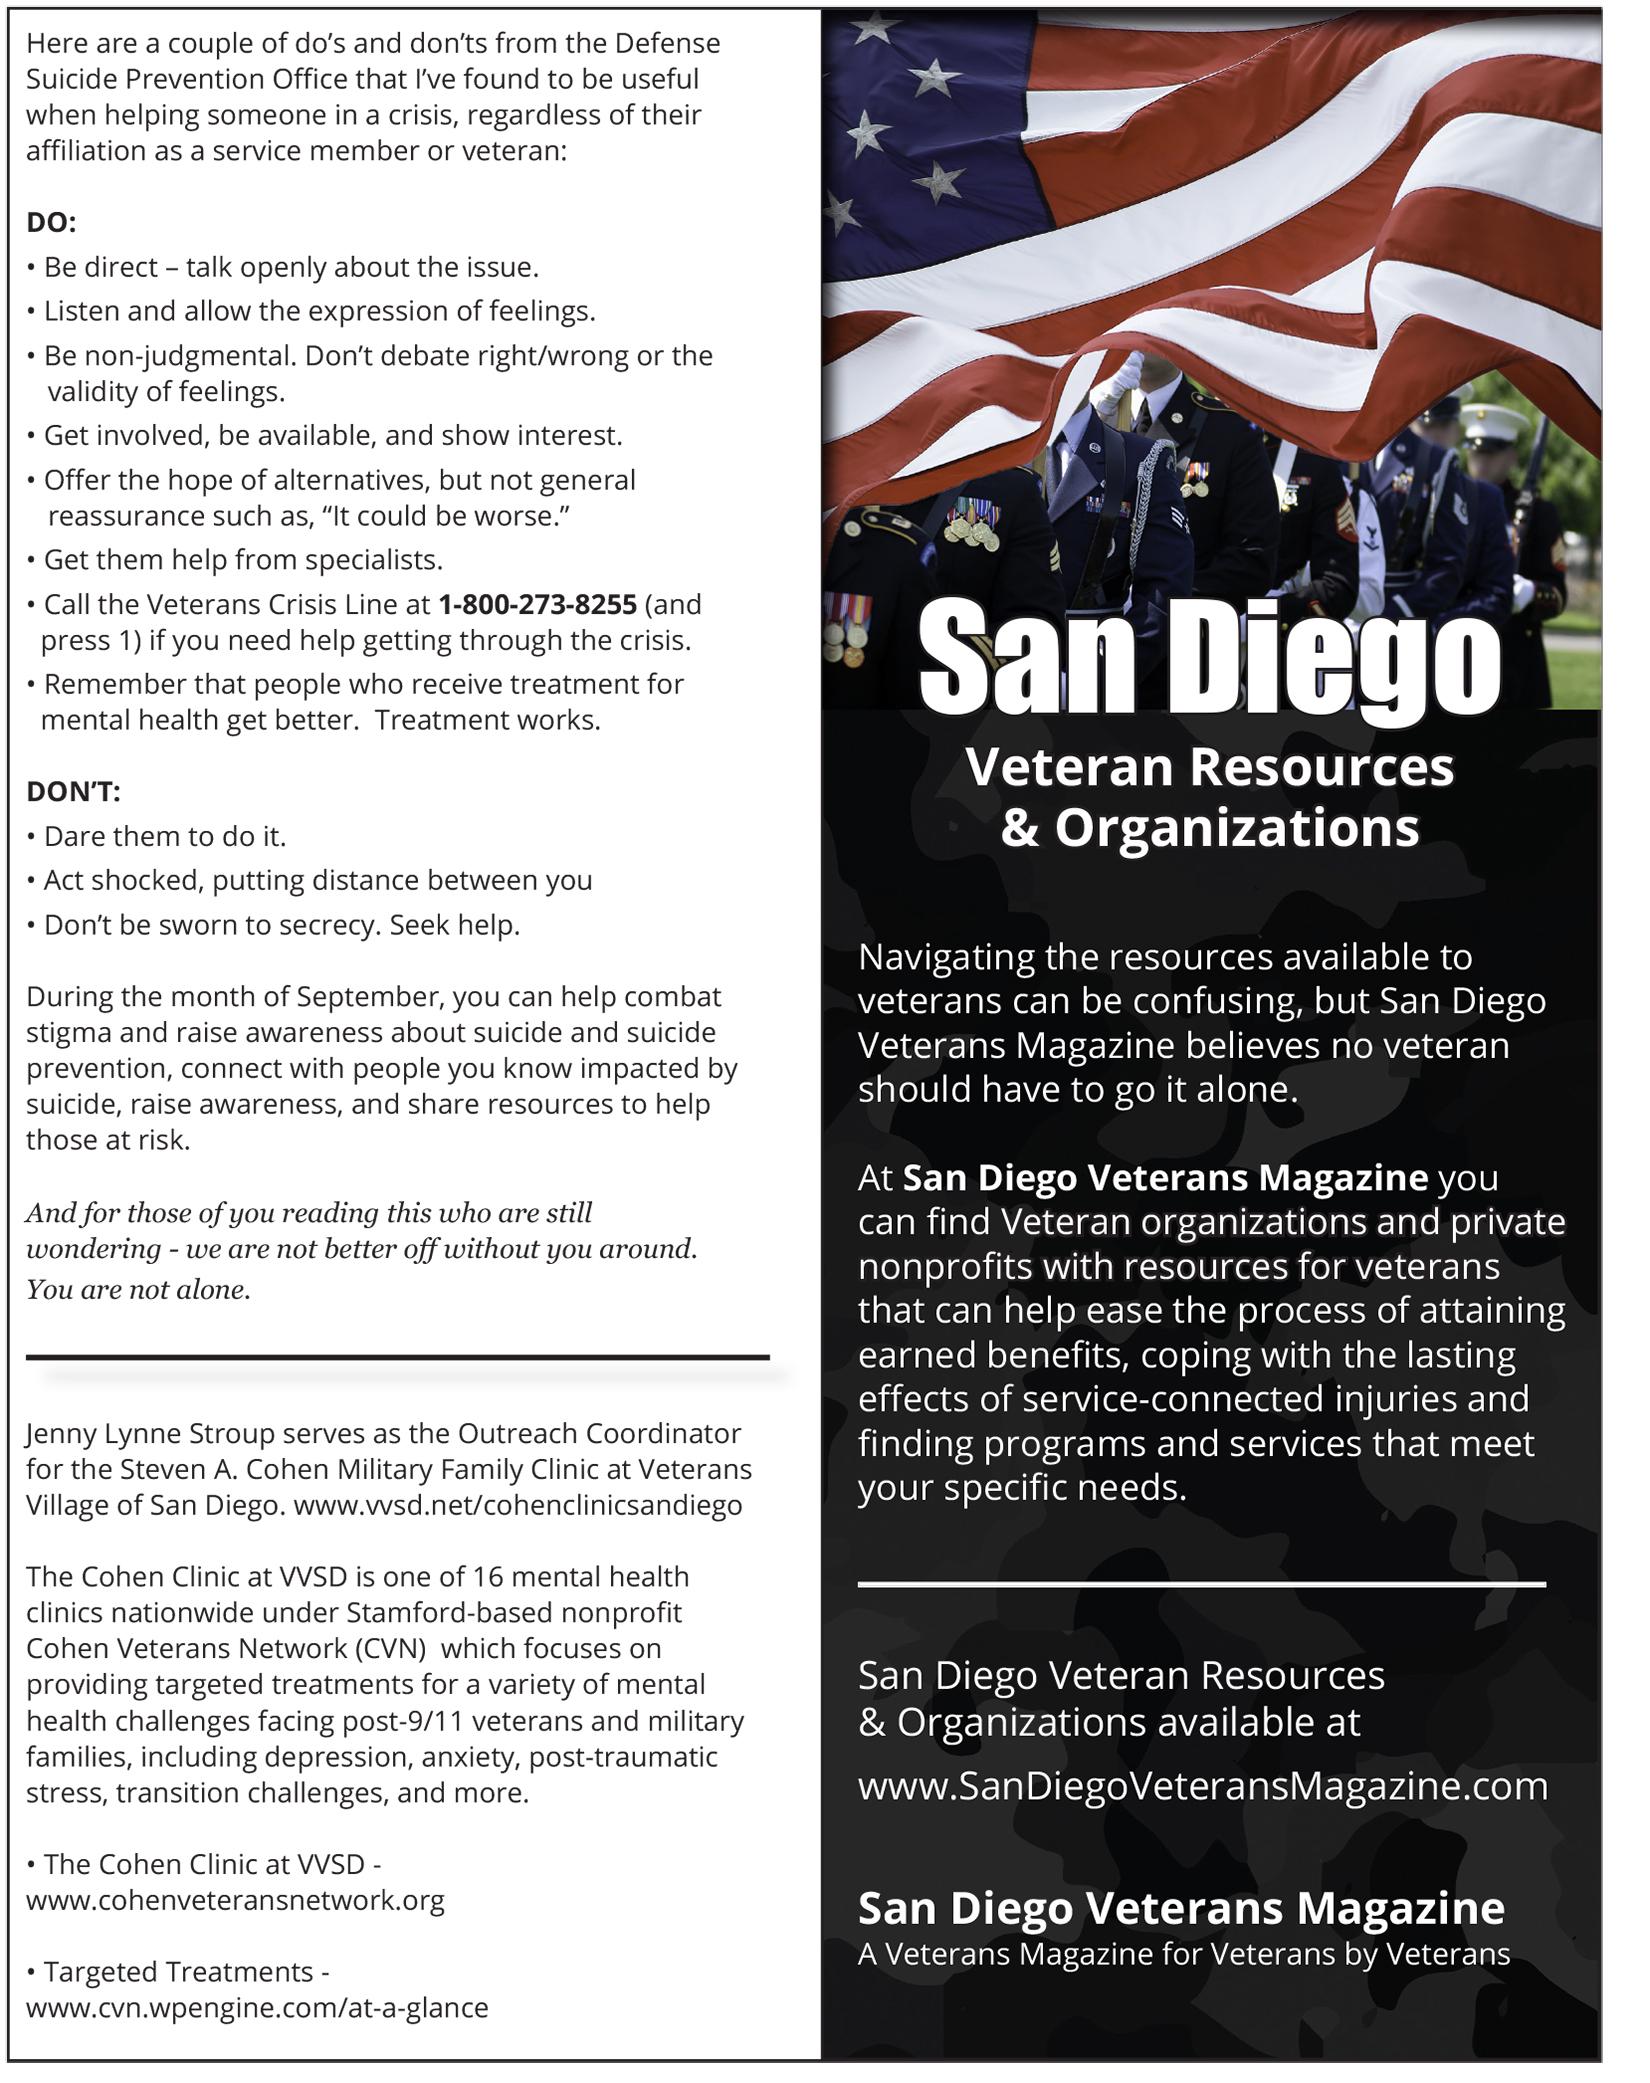 https://sandiegoveteransmagazine.com/wp-content/uploads/2020/09/29.jpg